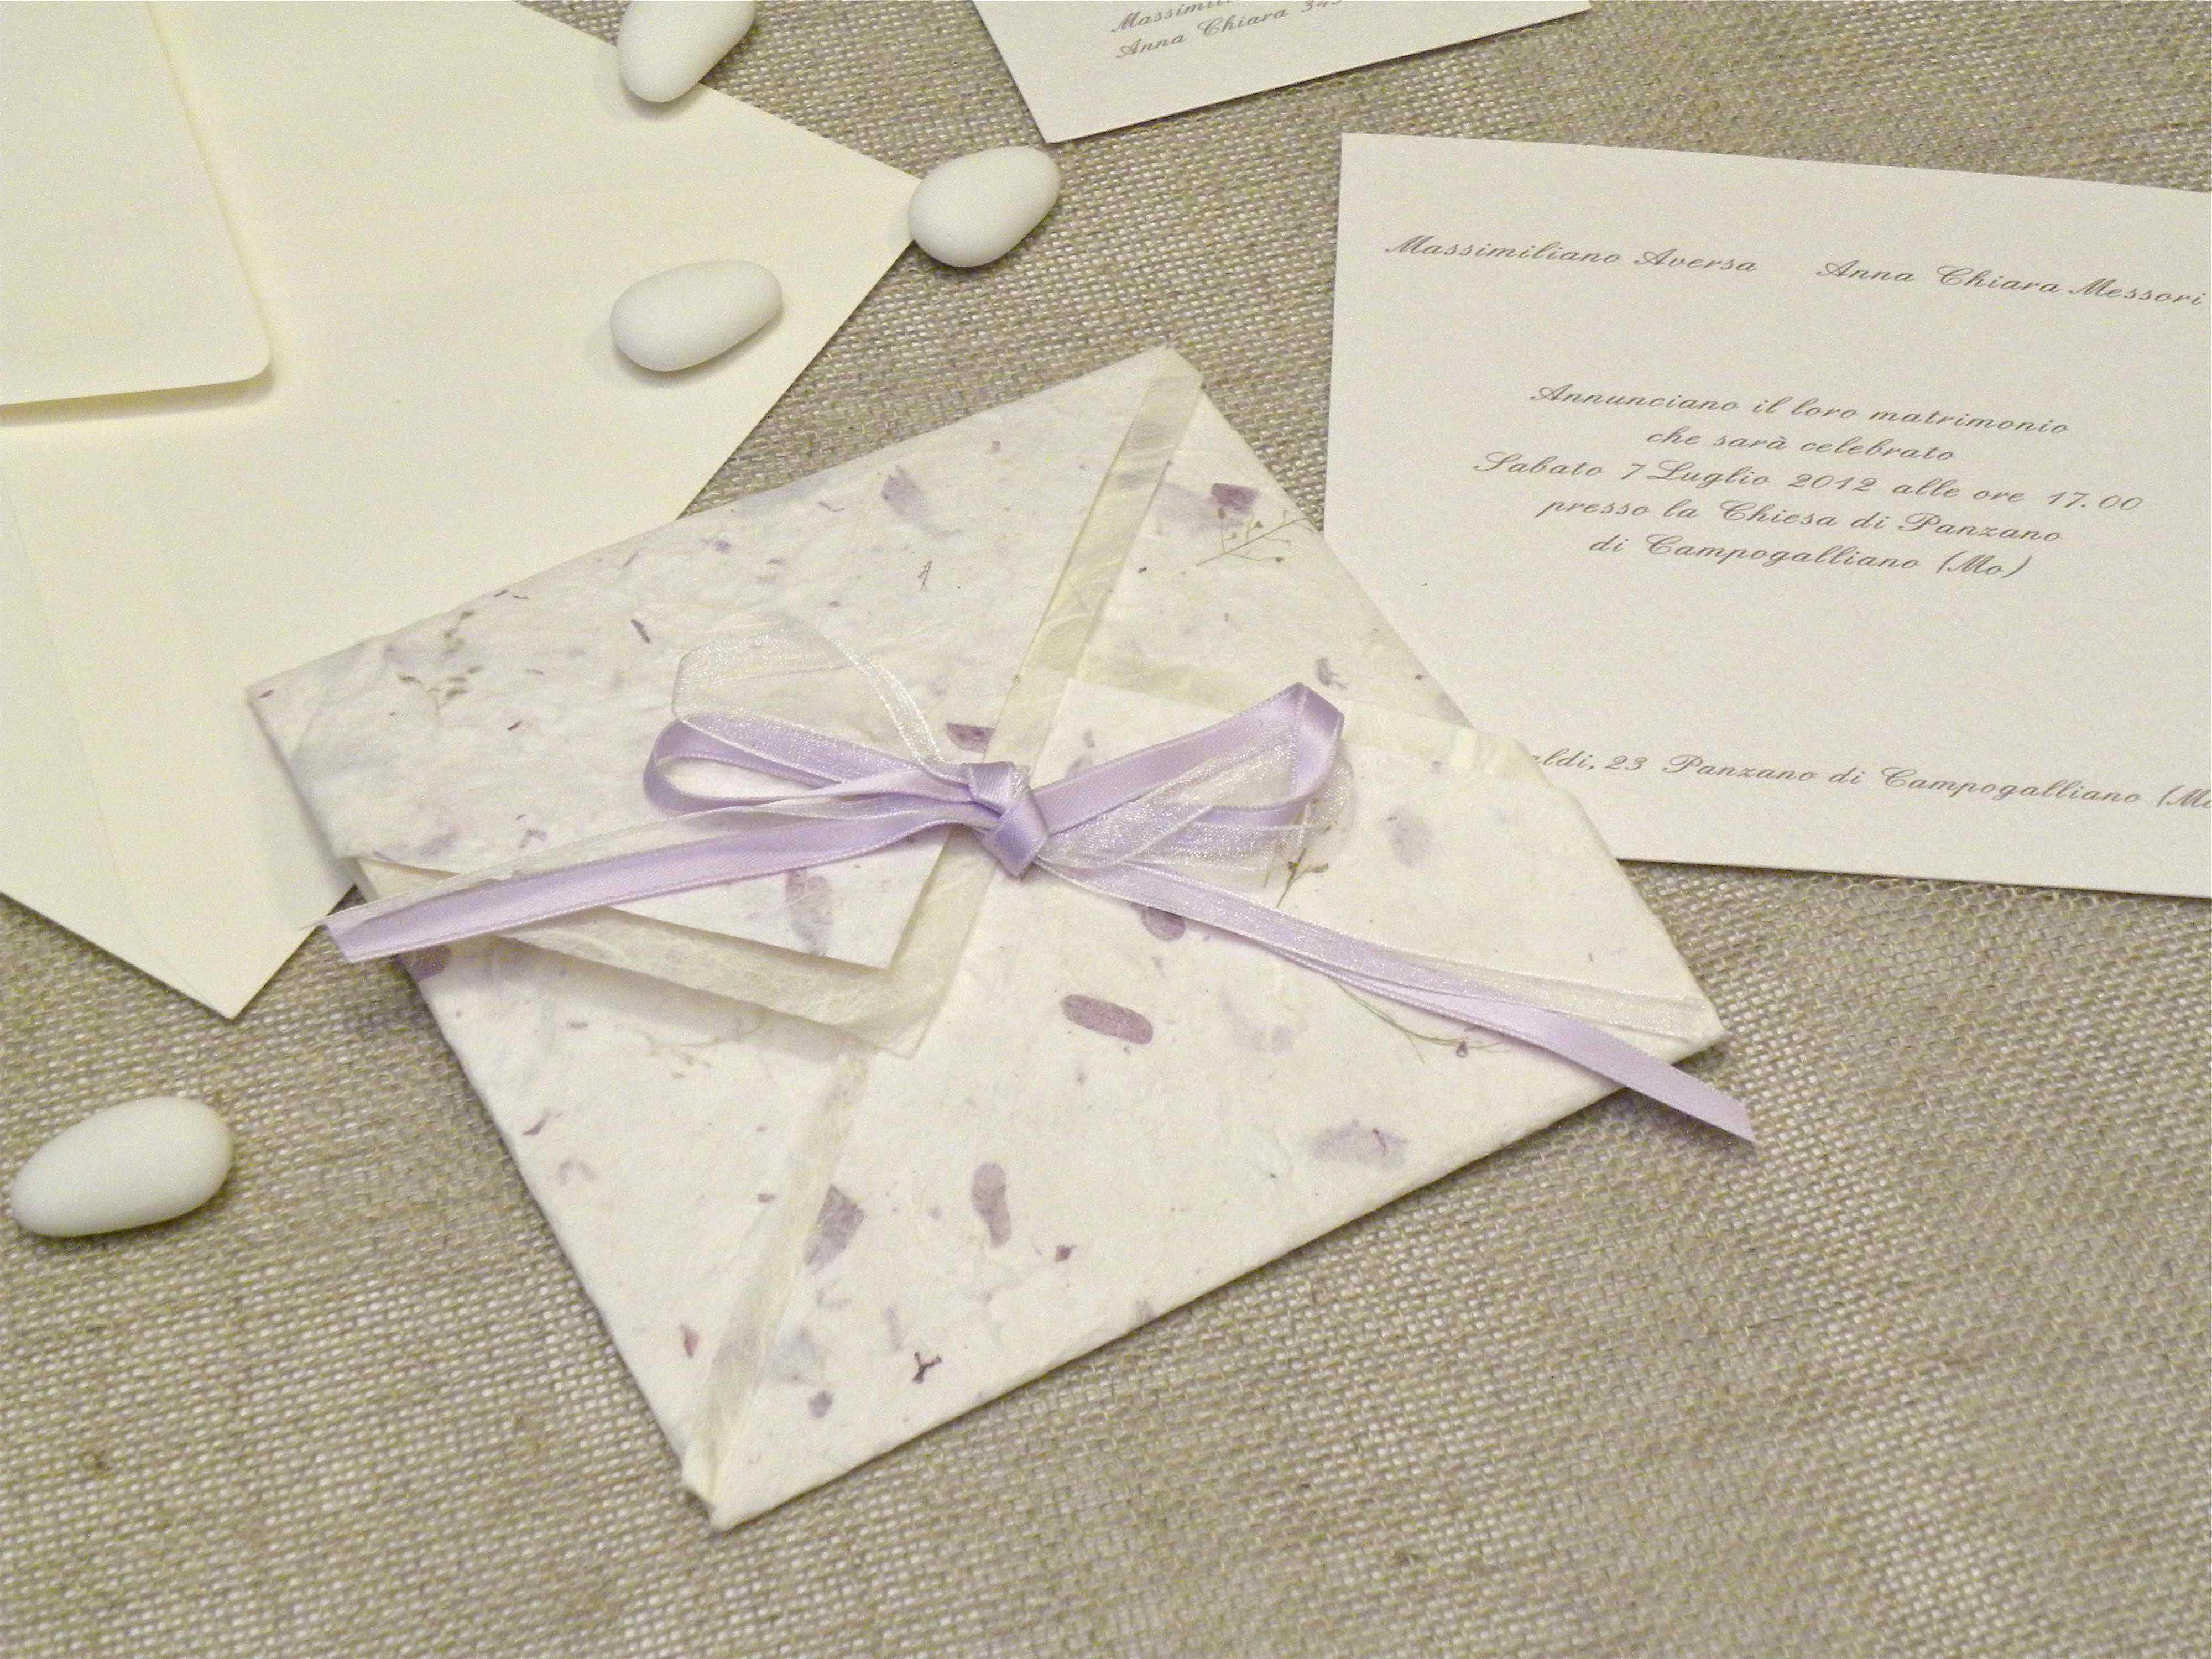 Wedding invitation origami in paper provence lilac - photo#49